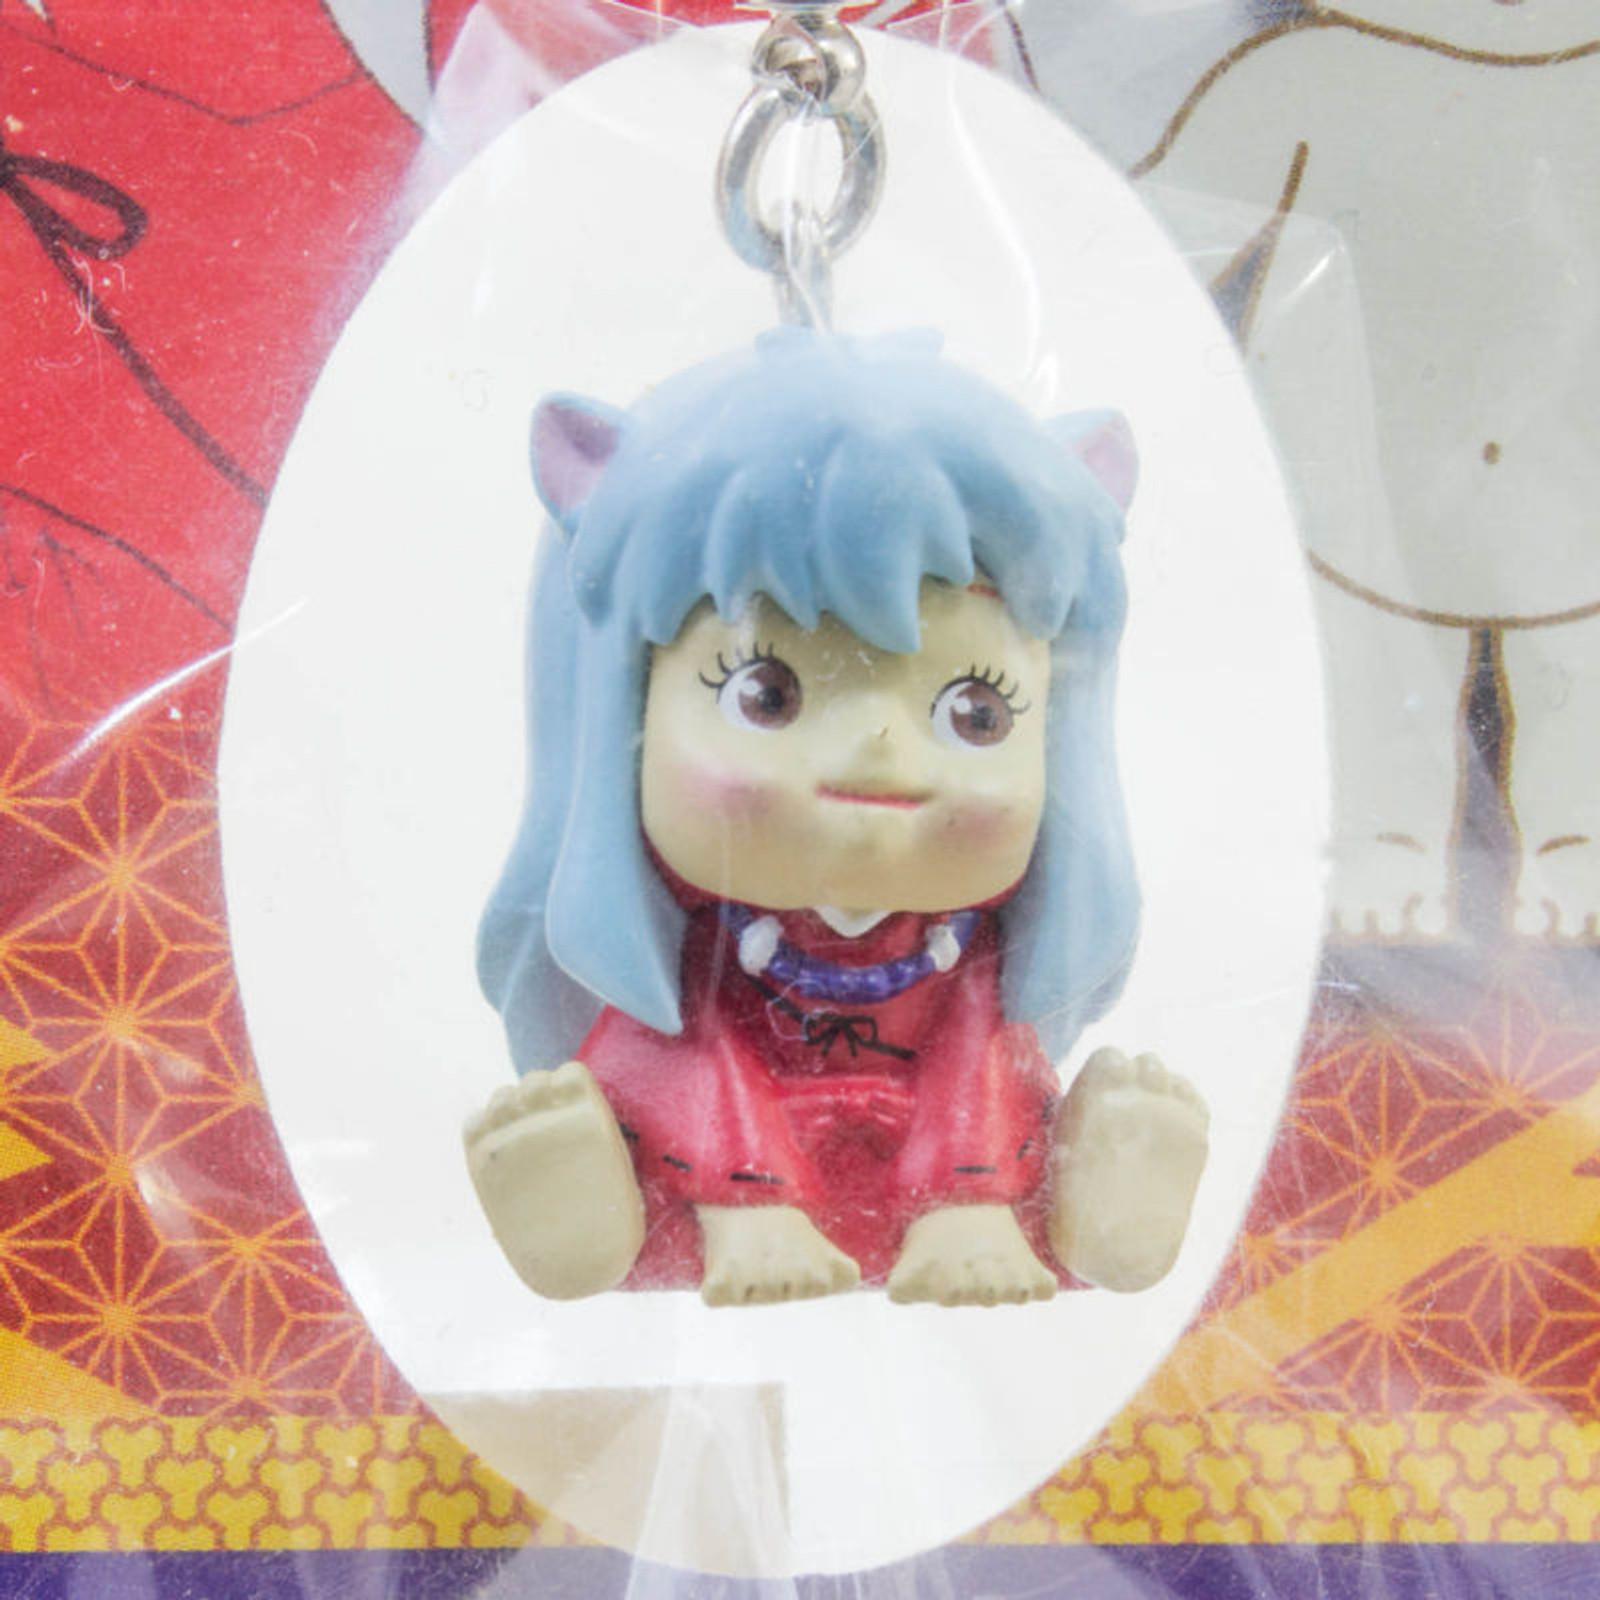 RARE! Inuyasha Rose O'neill Kewpie Kewsion Strap JAPAN ANIME MANGA